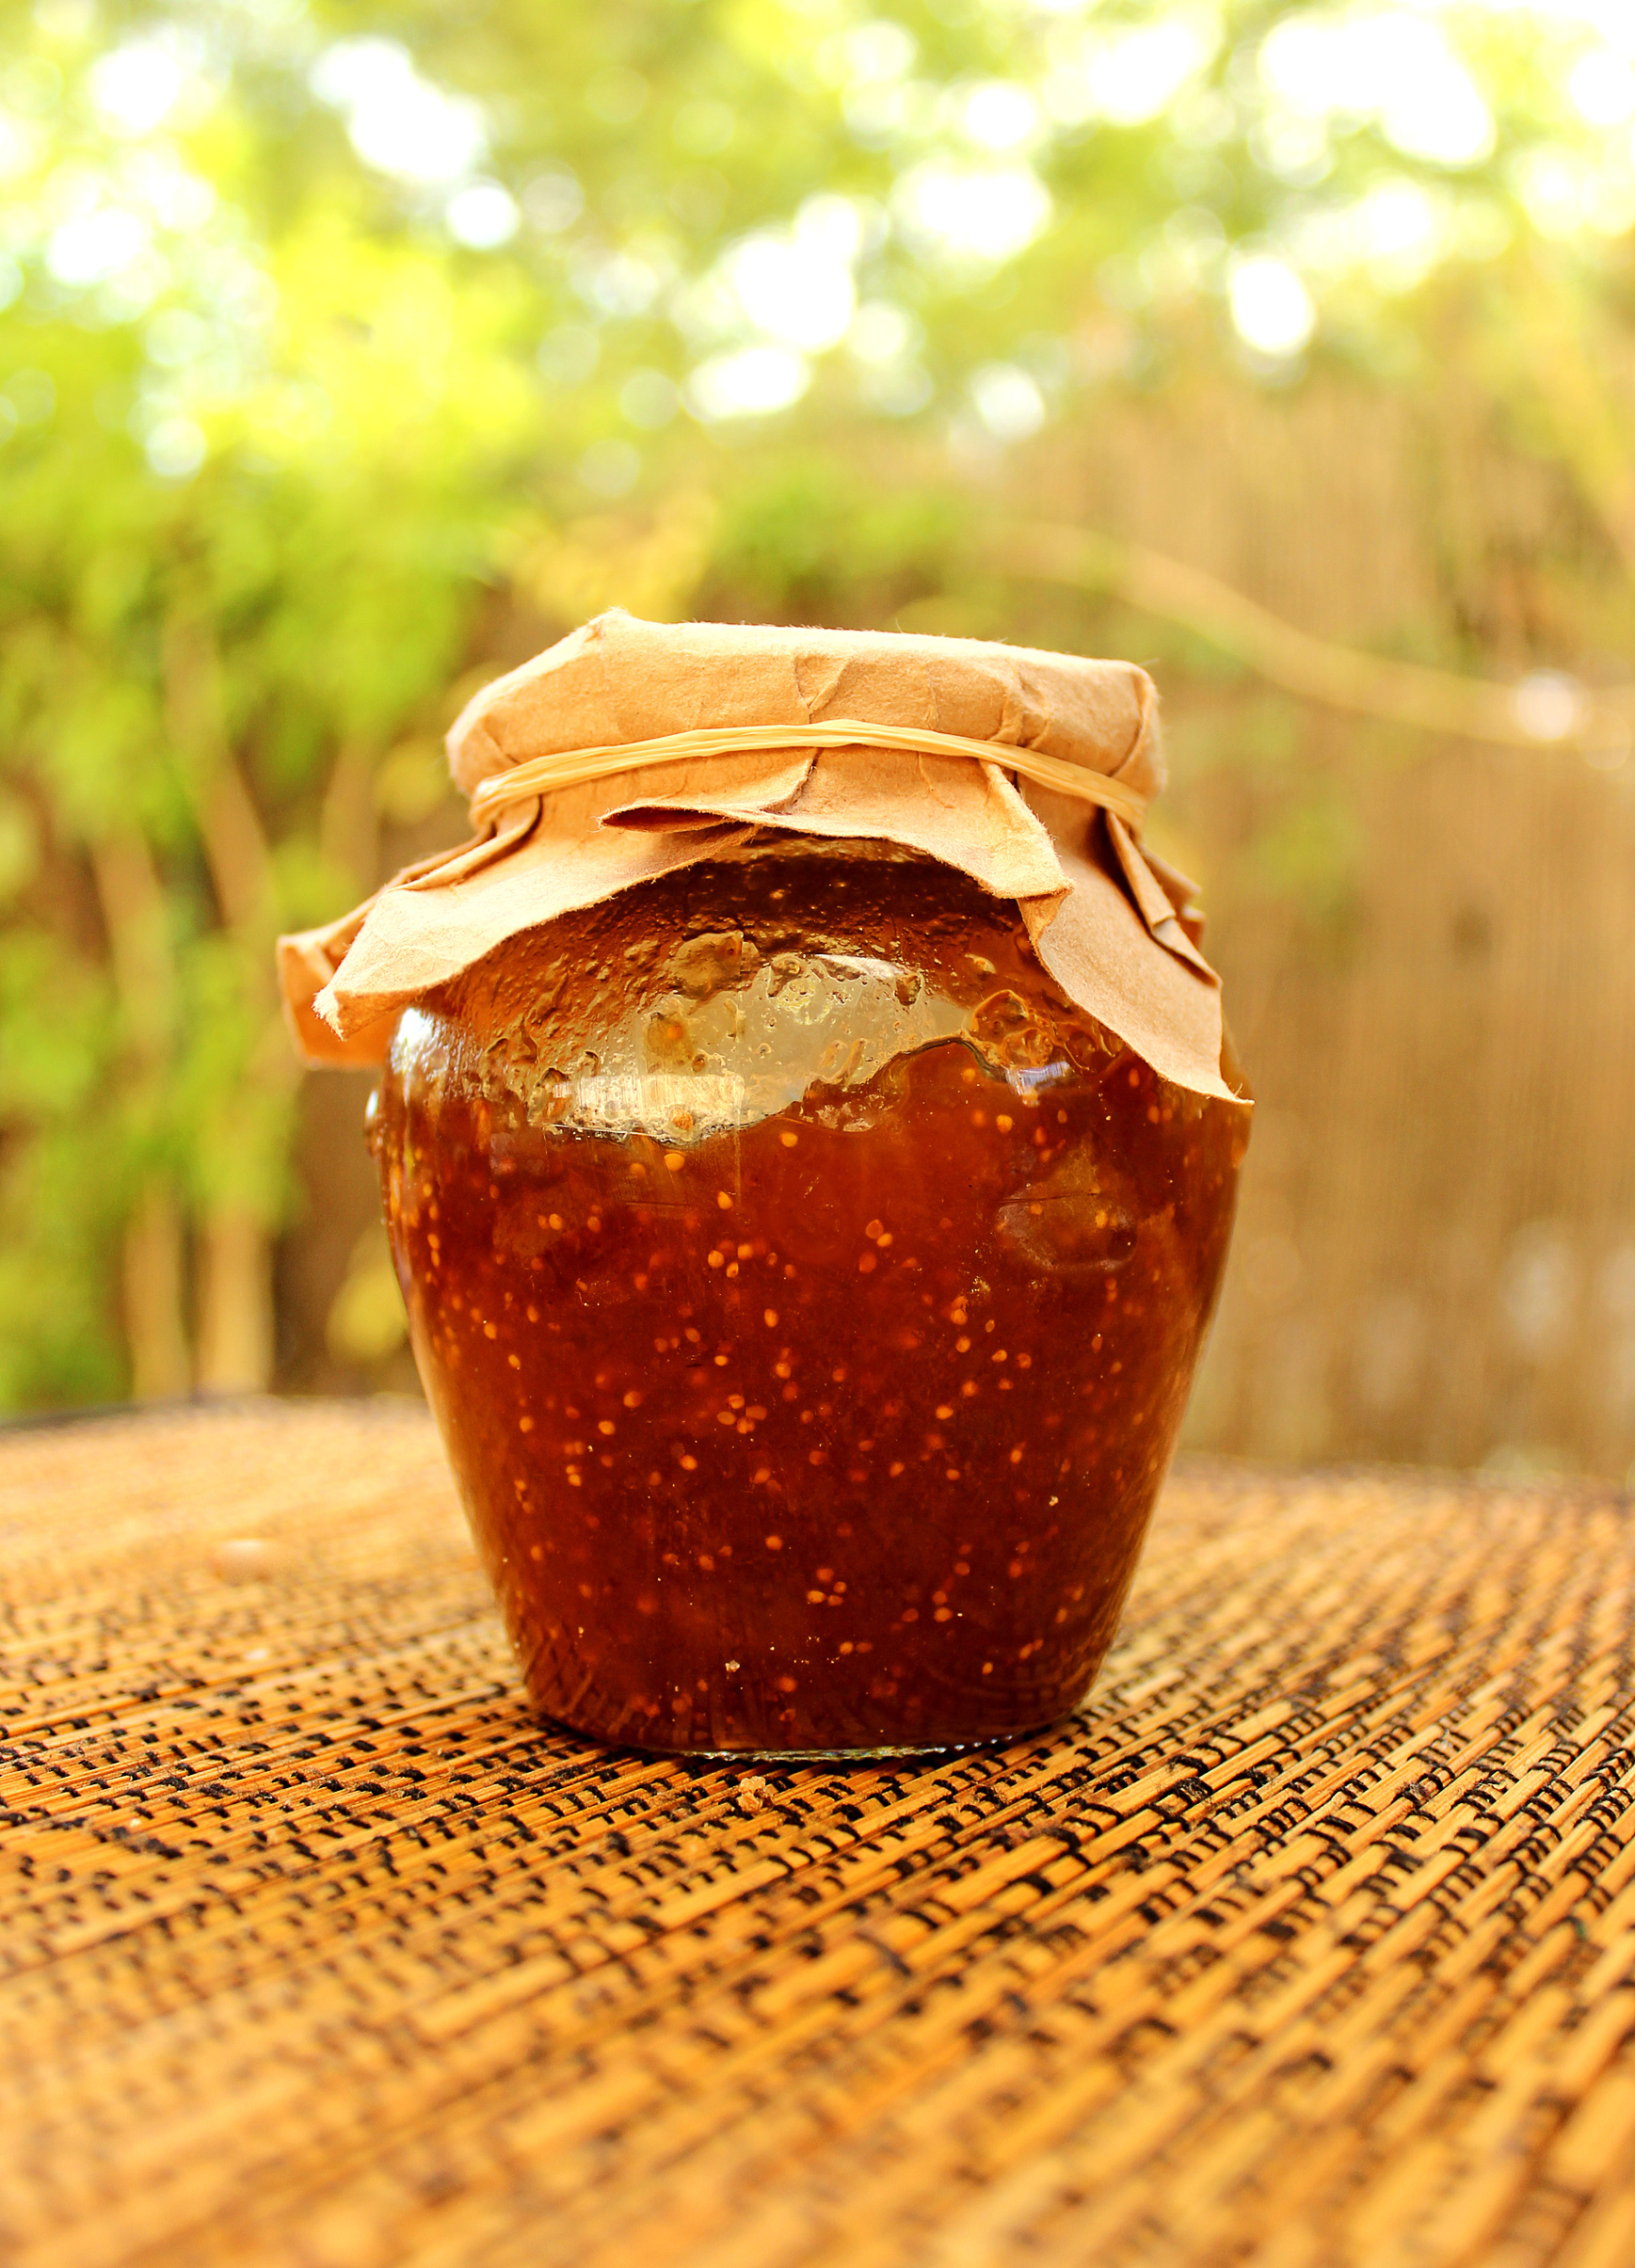 Homemade Fig Jam, Breakfast, Home-made, Sweet, Ripe, HQ Photo